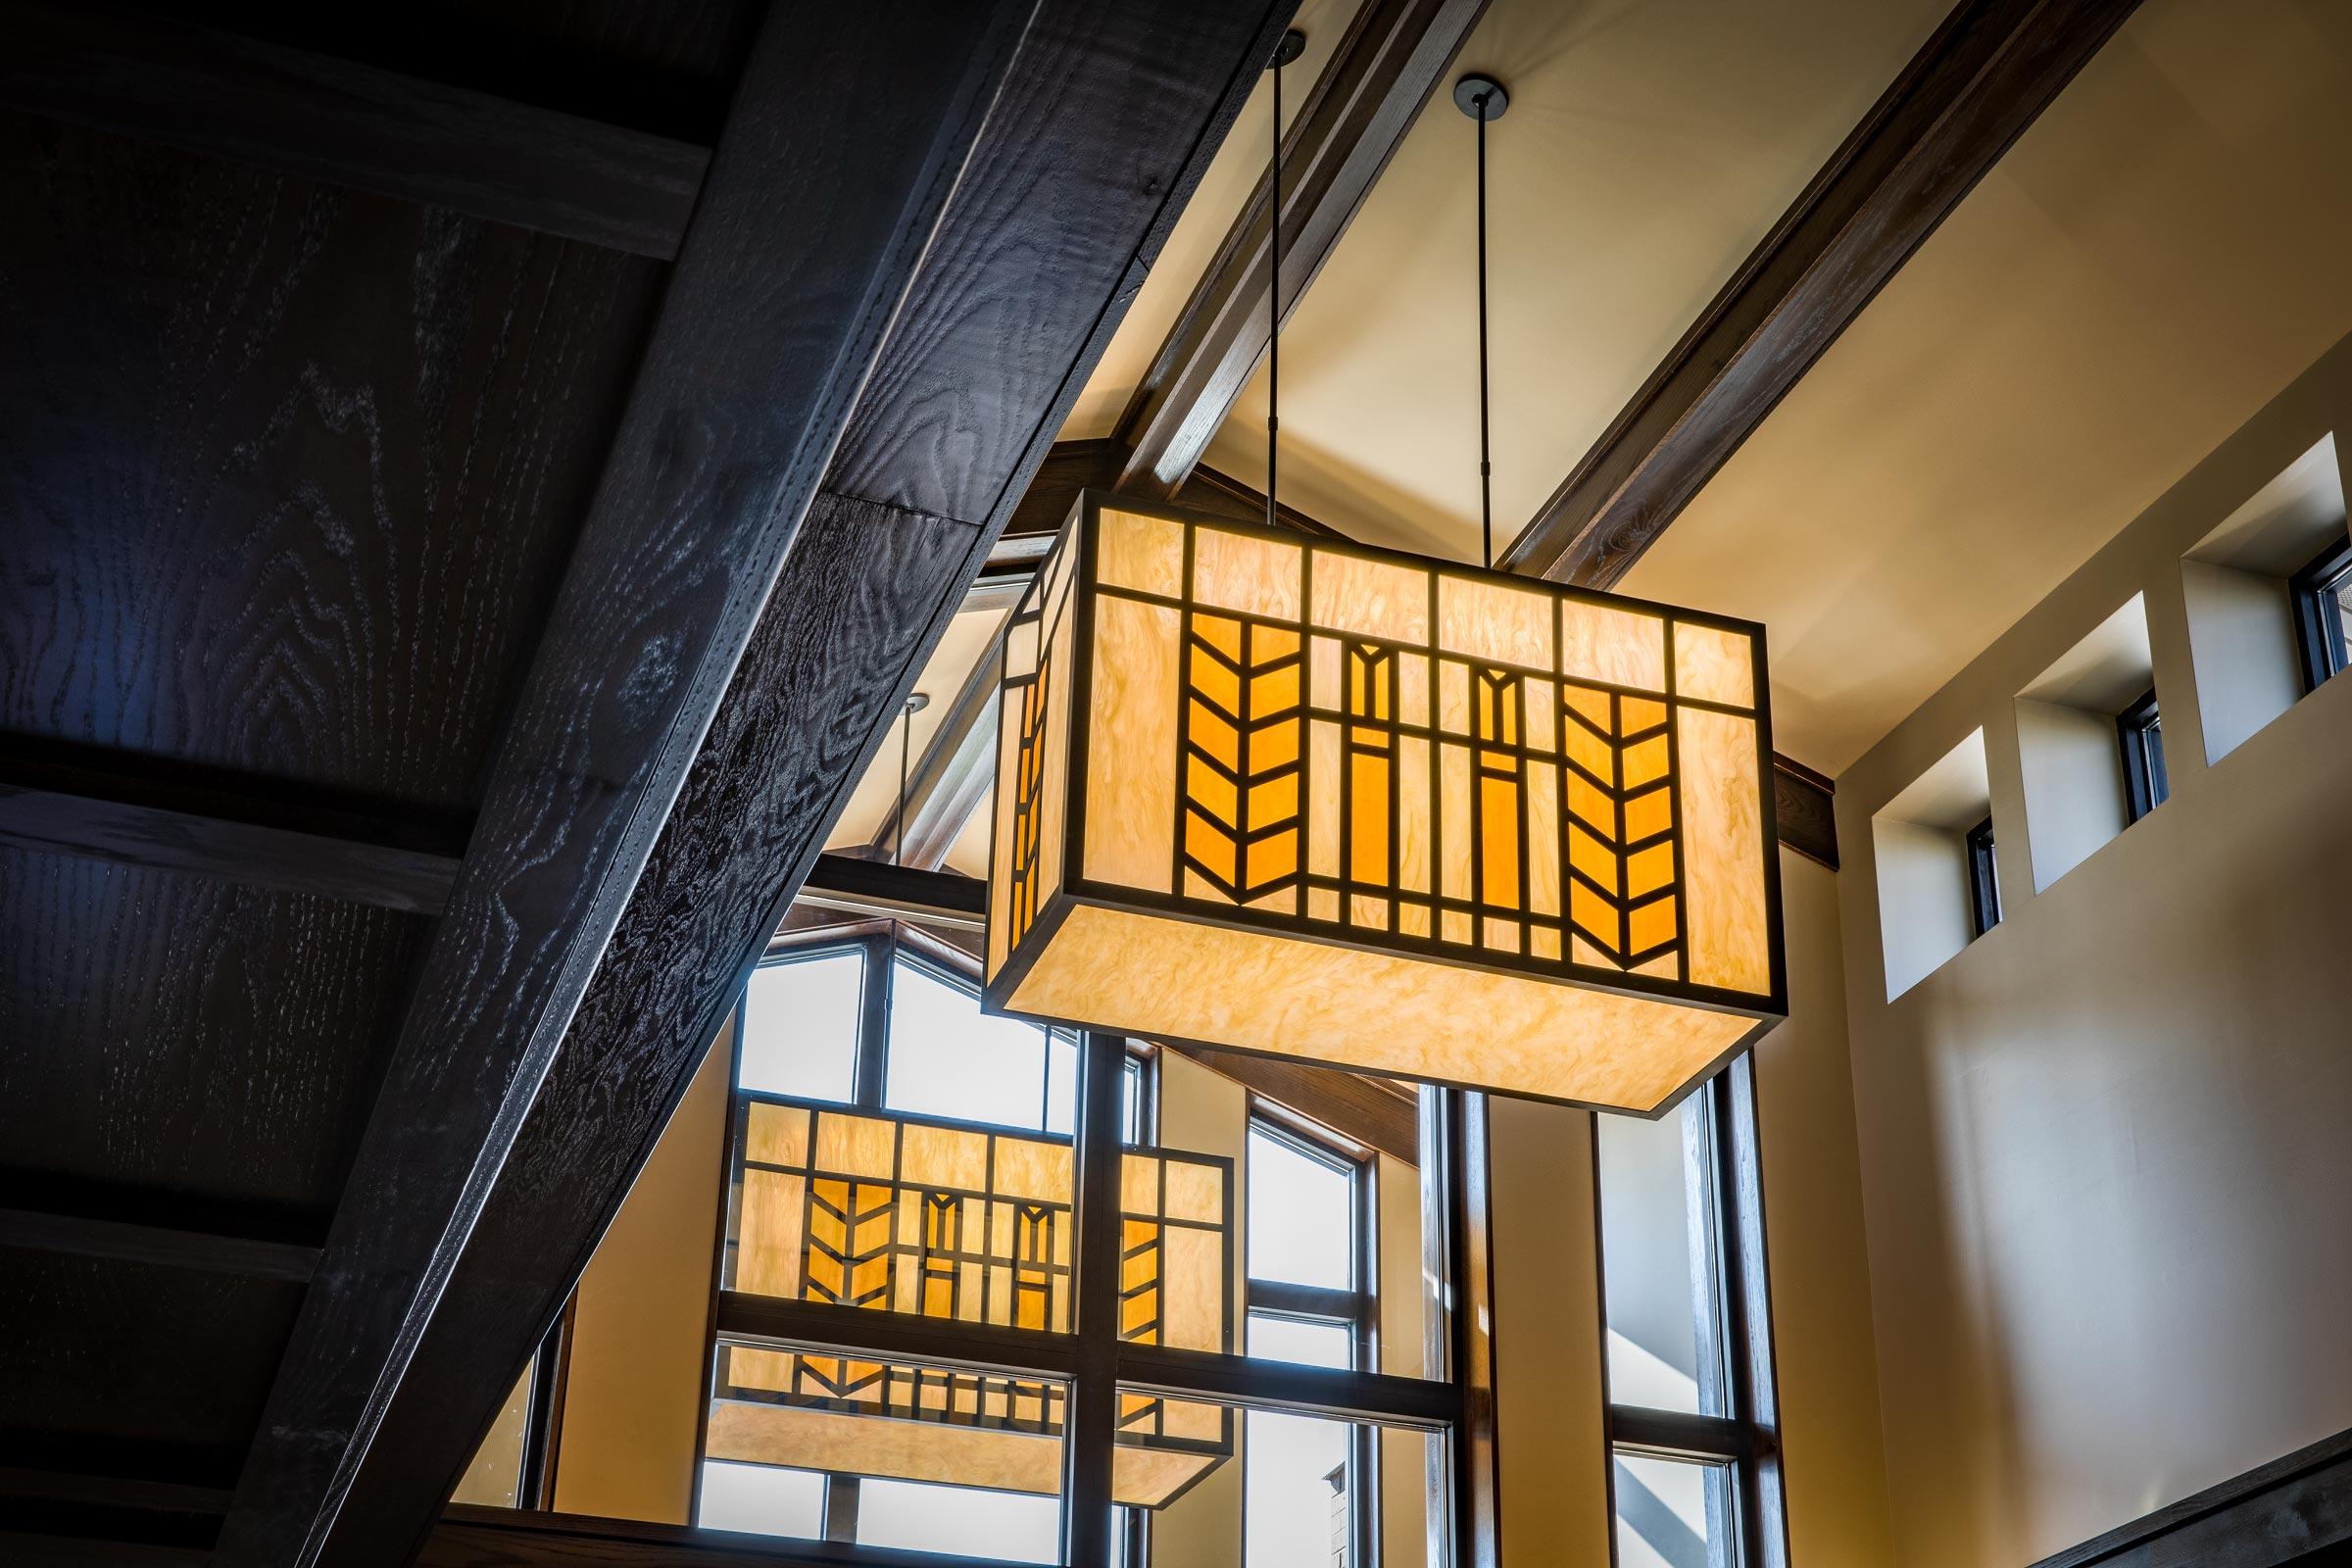 Homebank lobby ceiling lights